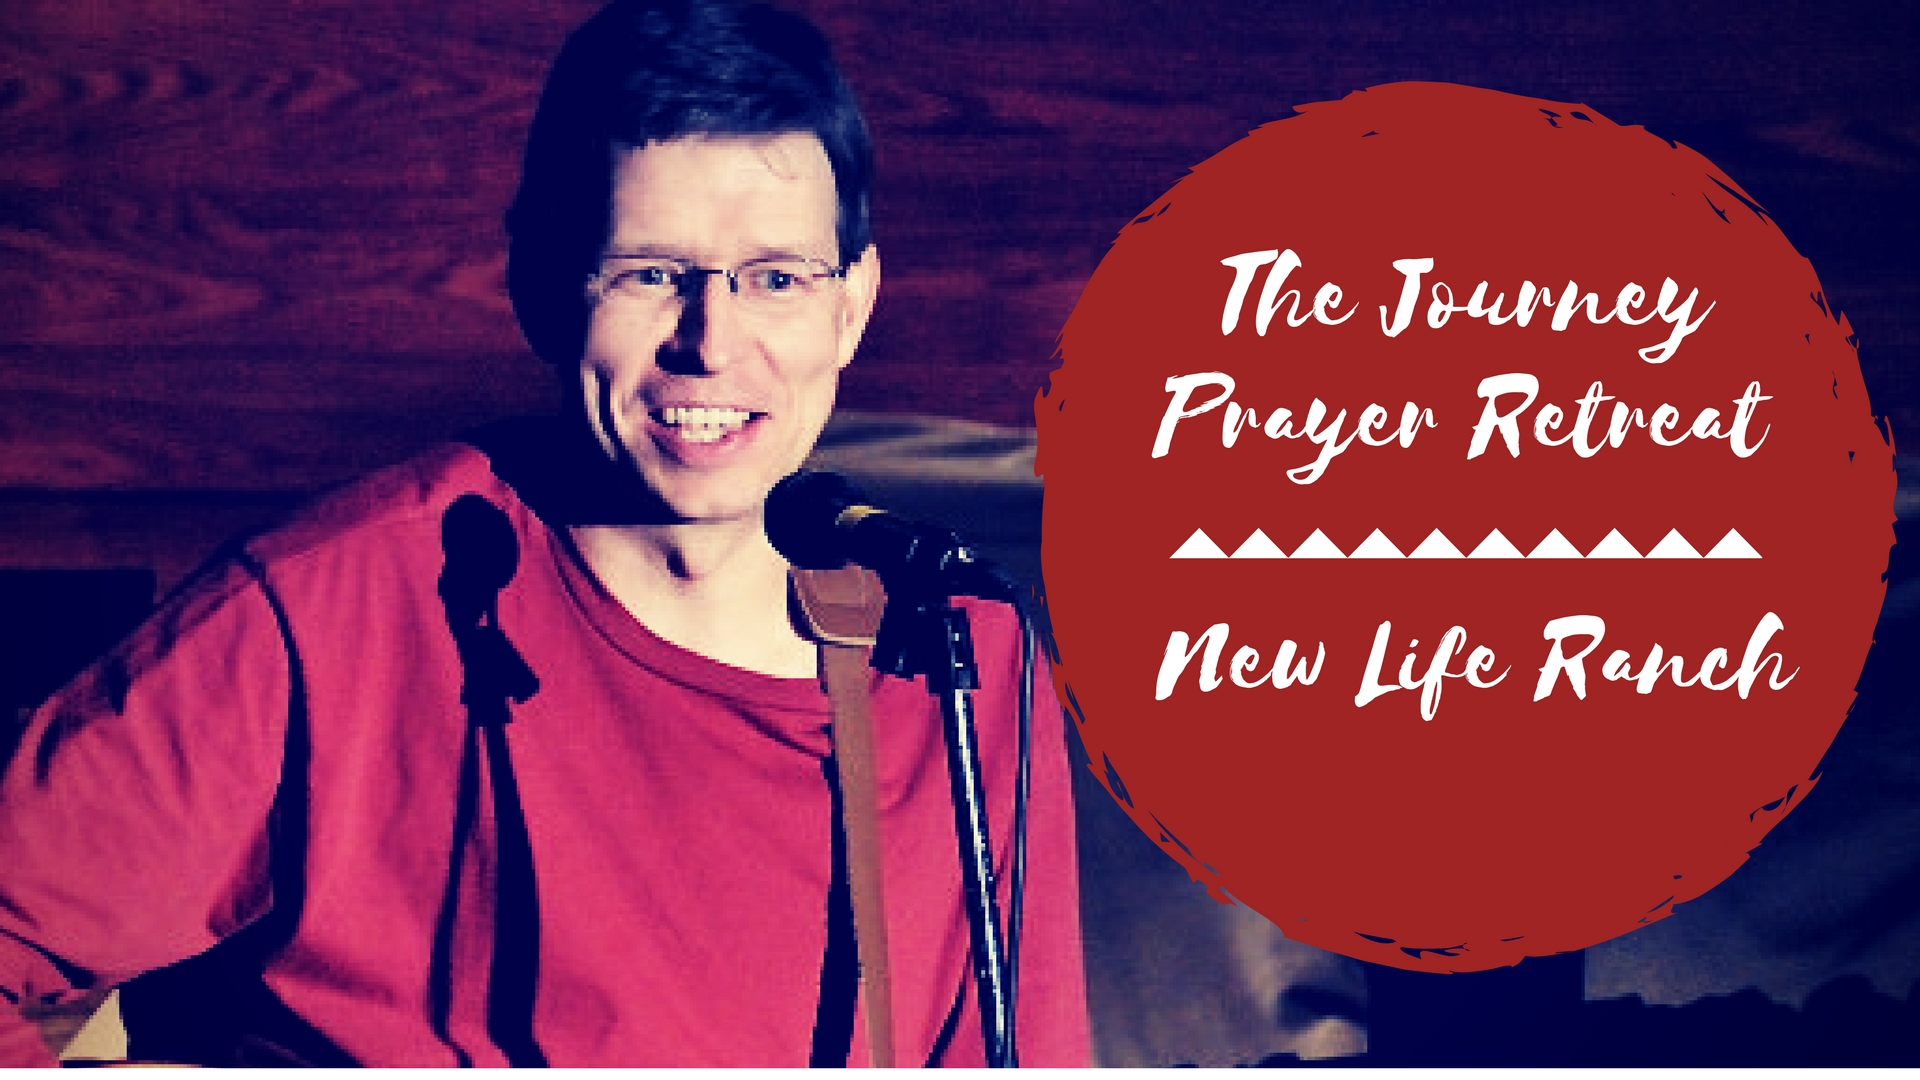 Journey prayer retreat 2017  5